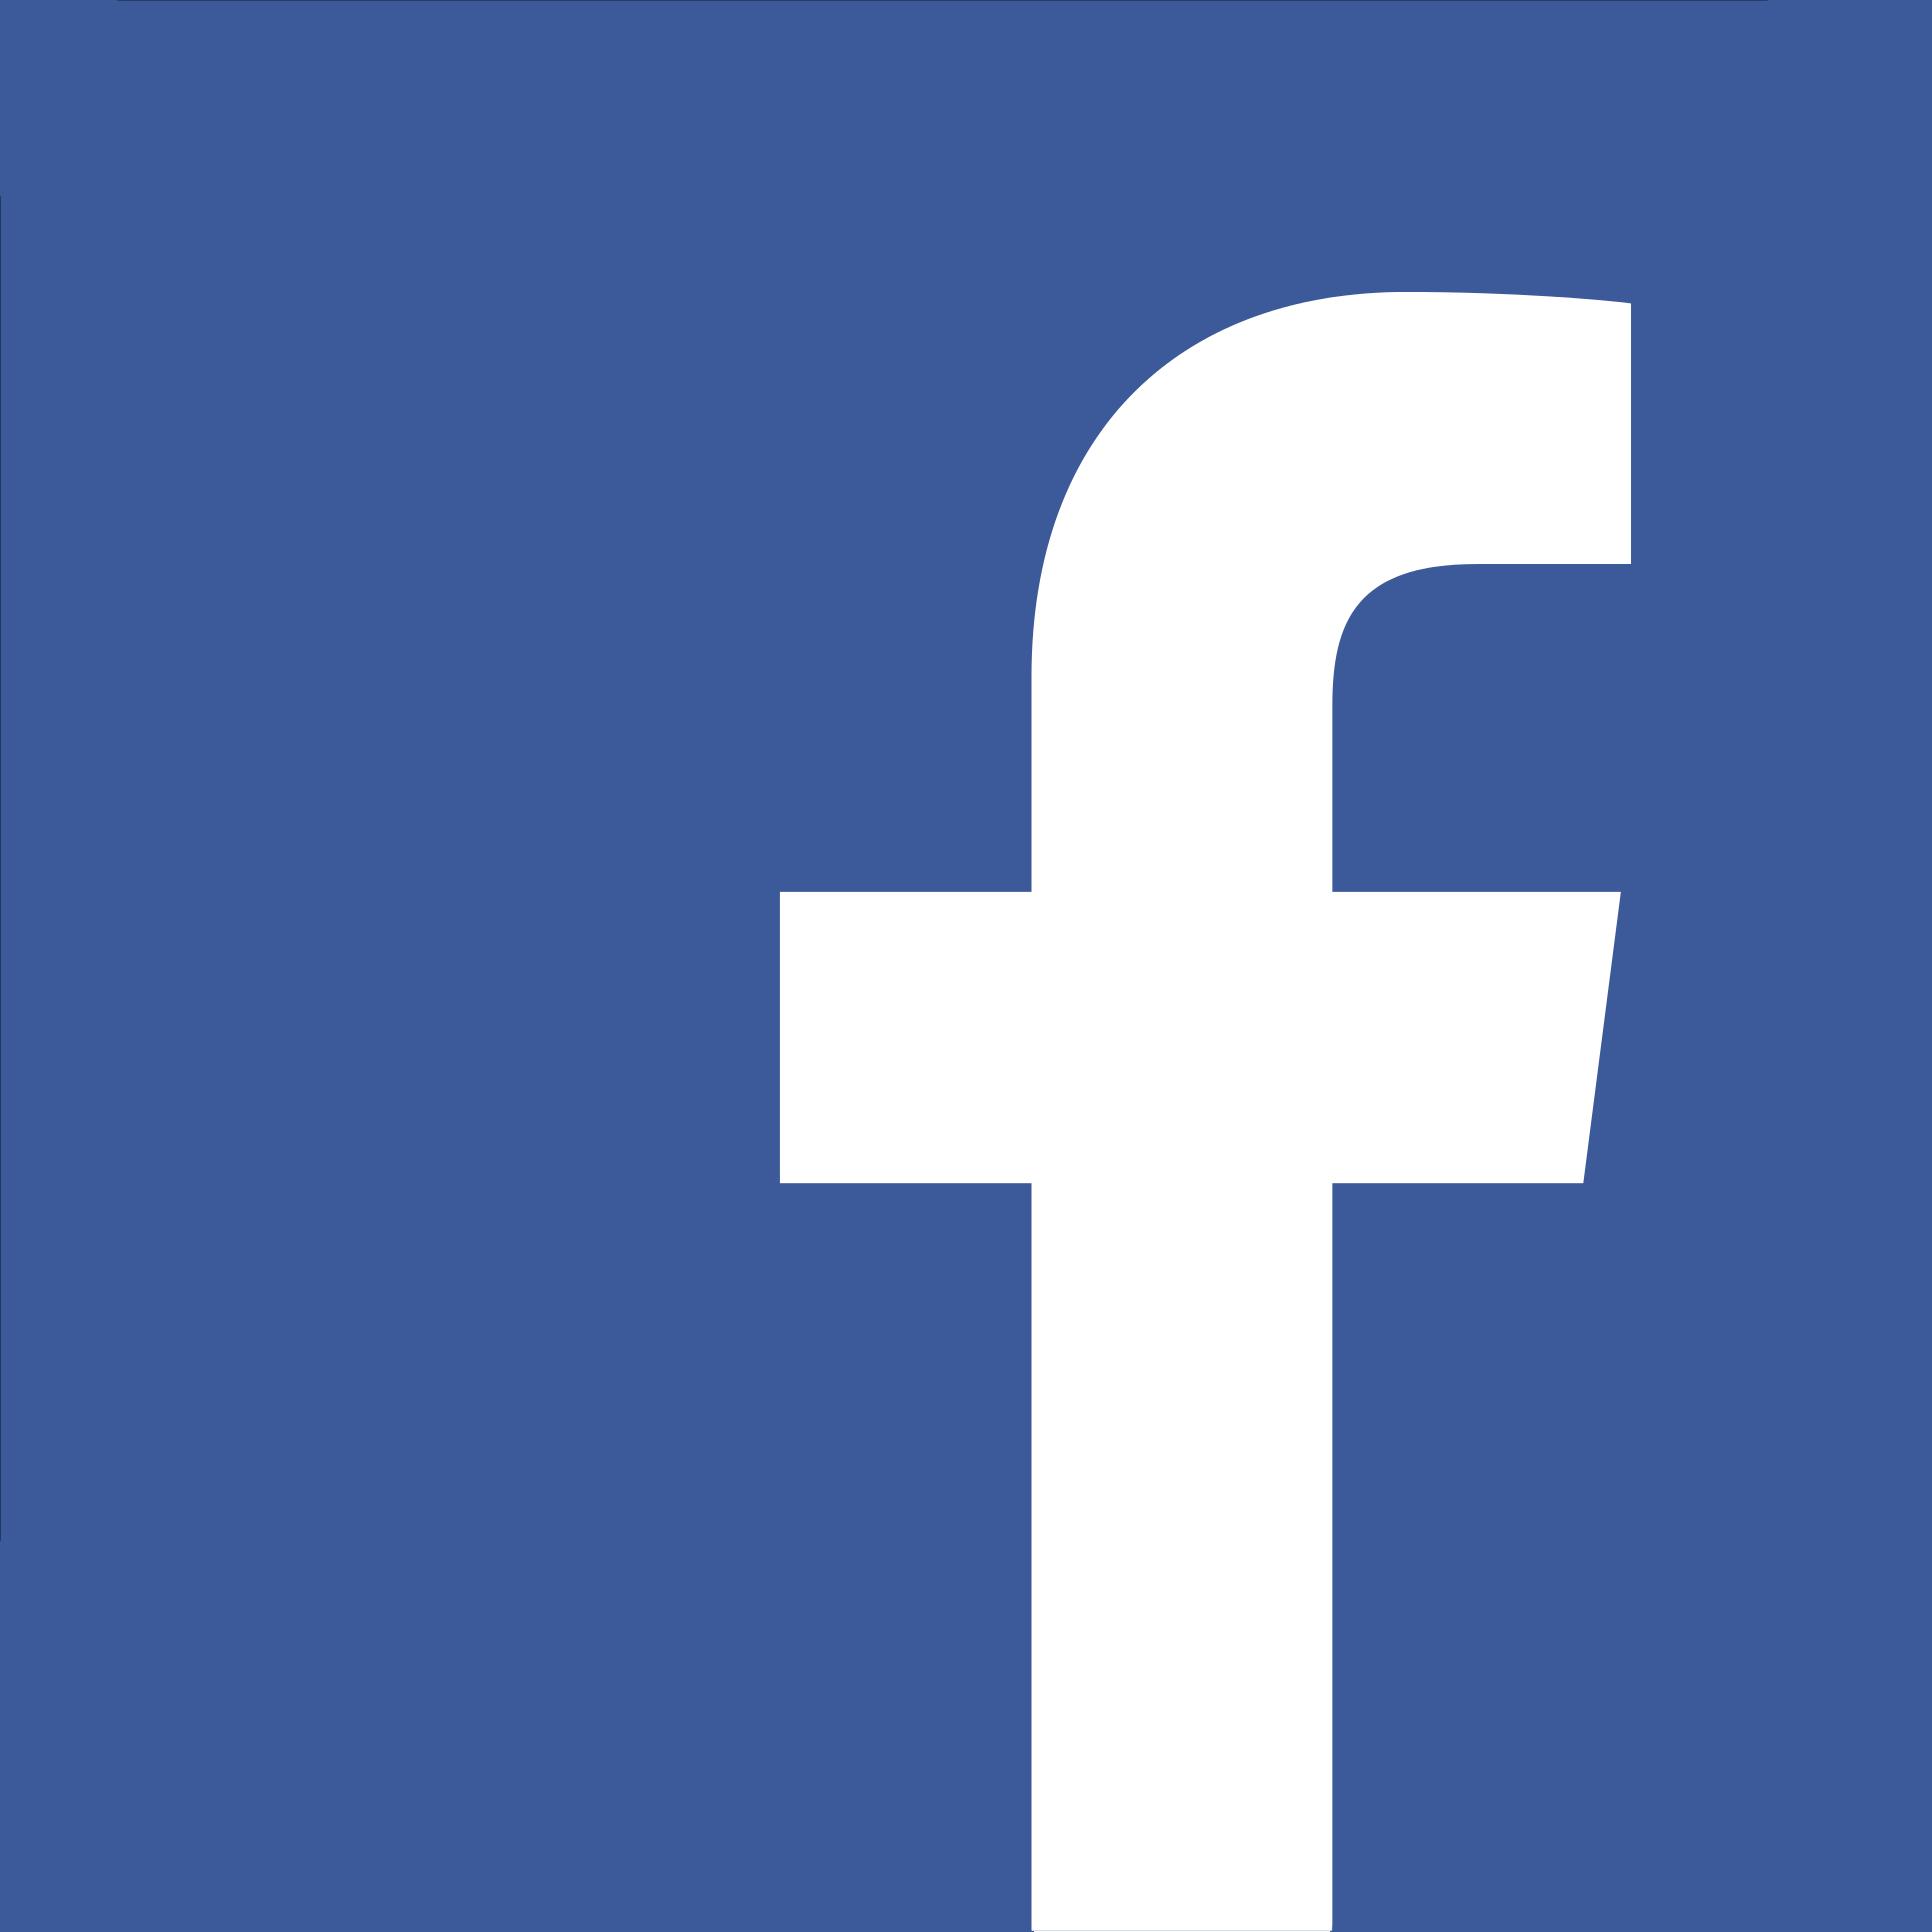 Autohaus Lick auf facebook.de